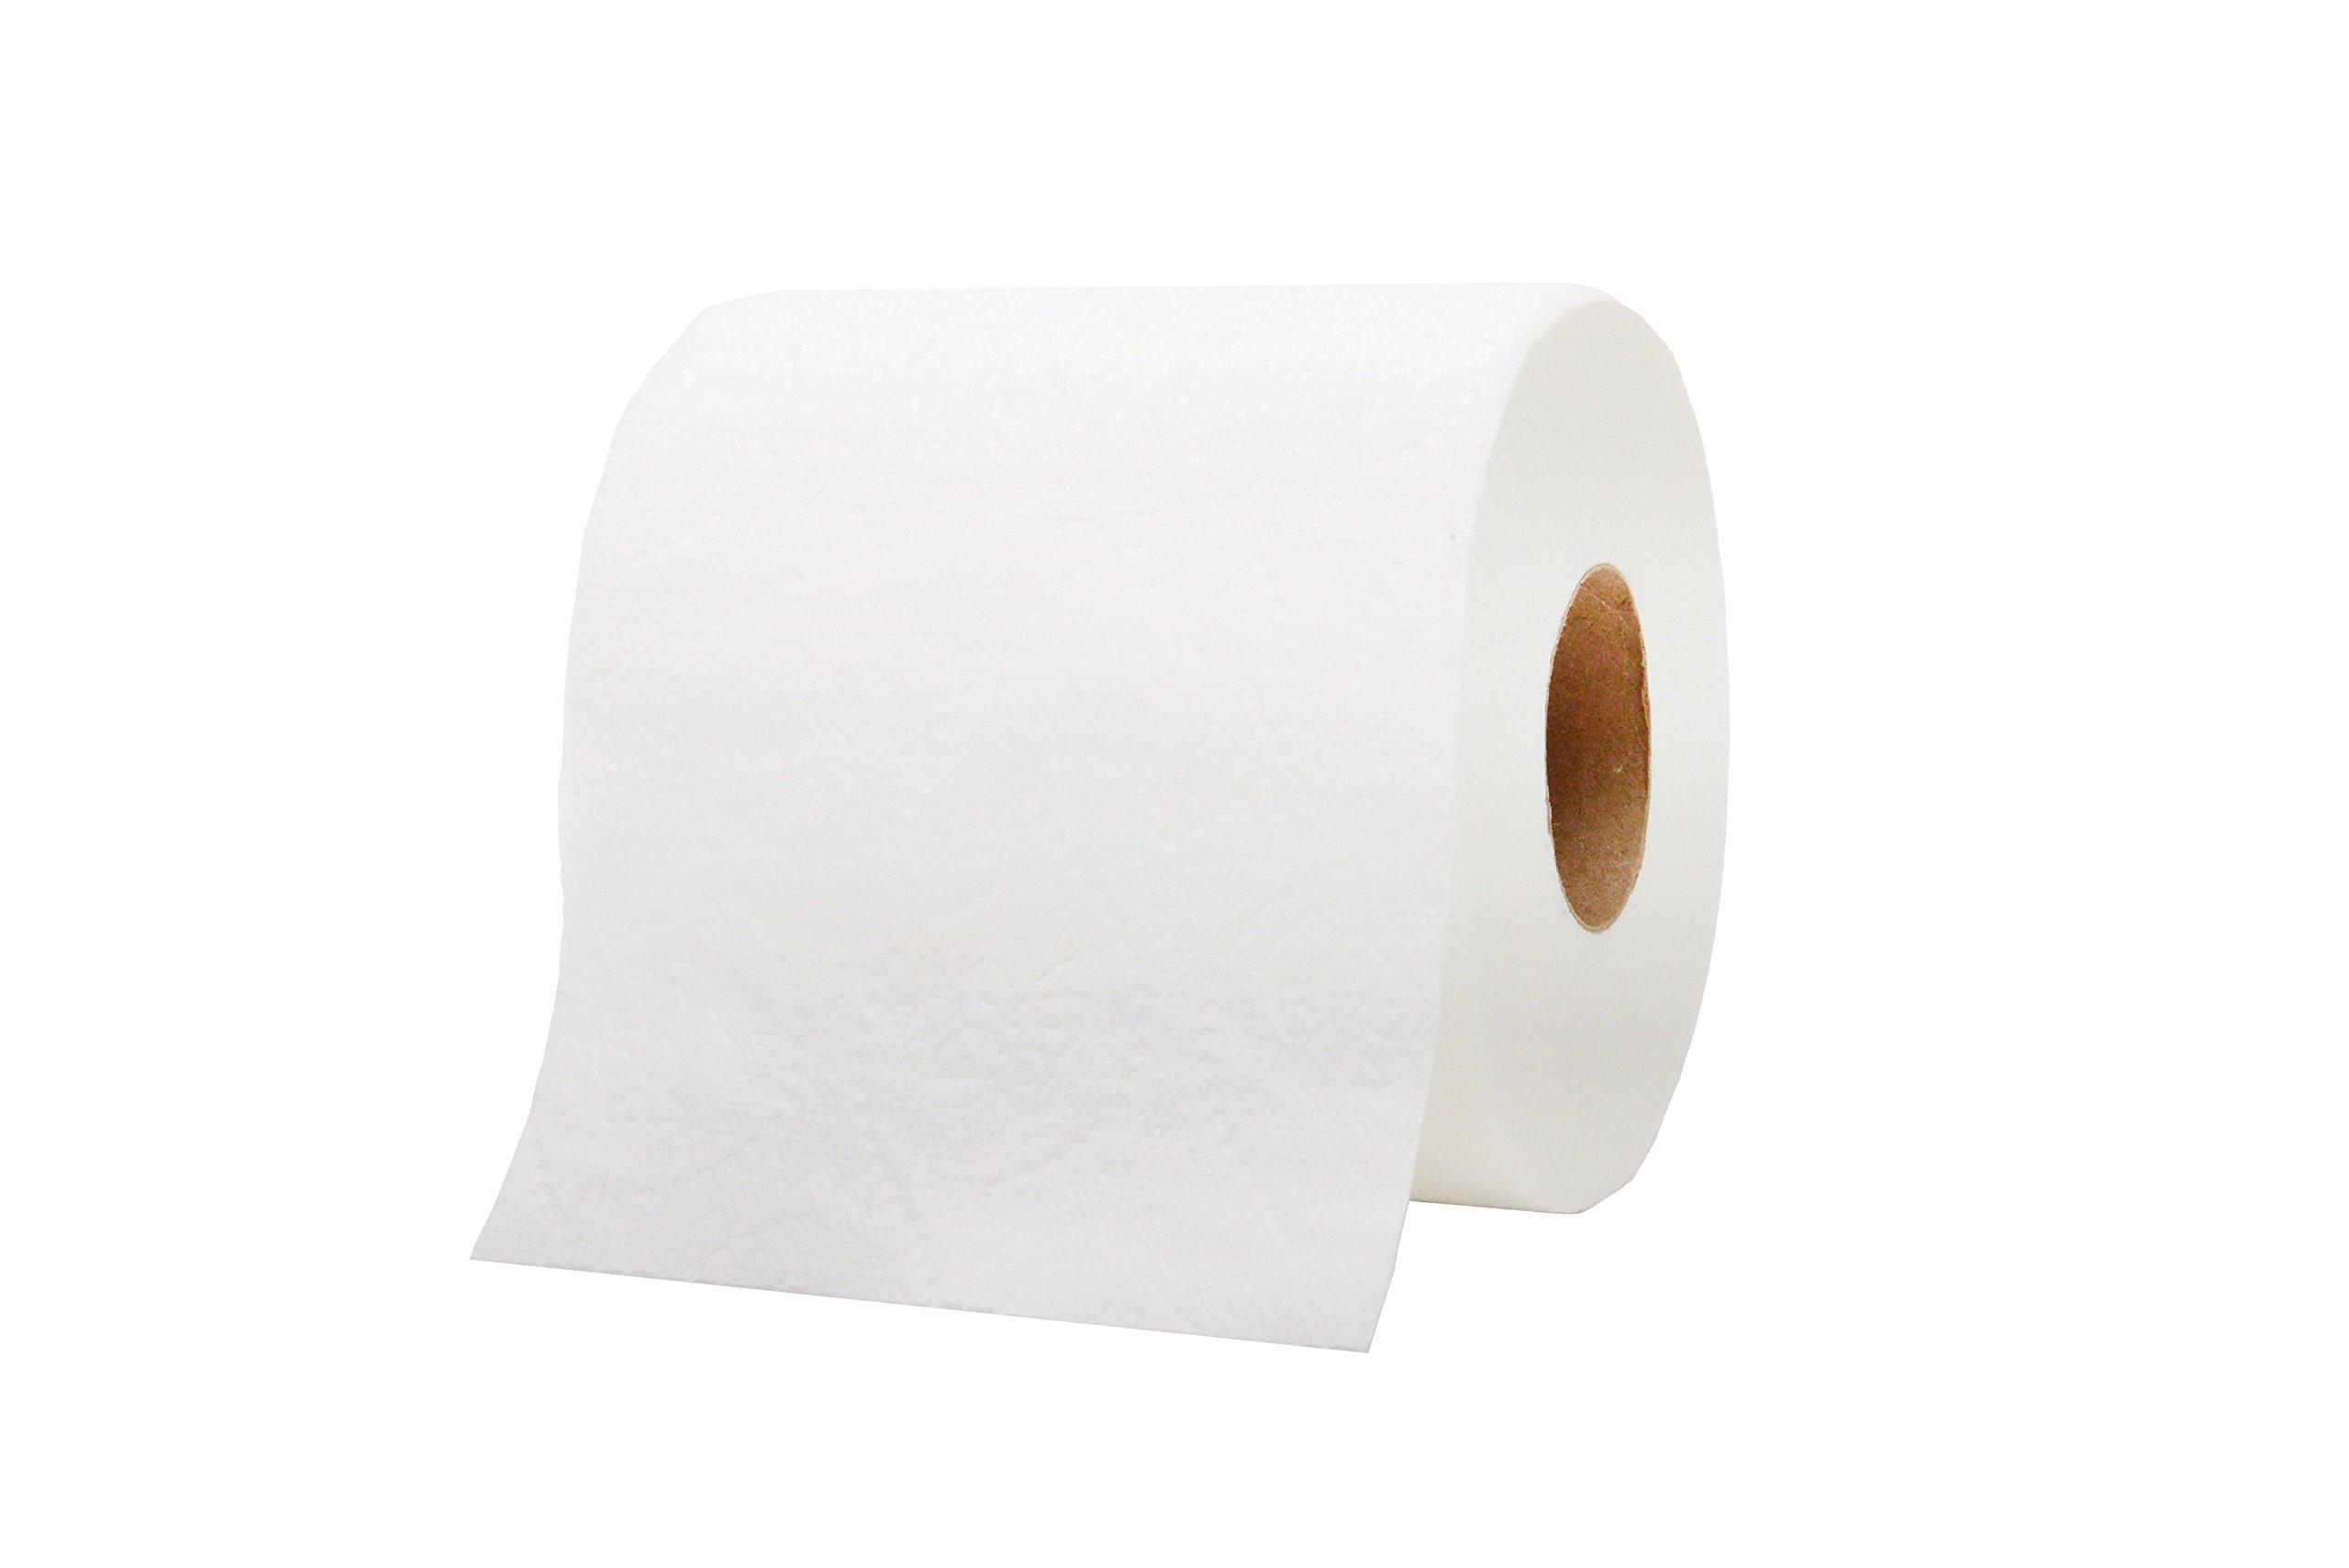 WAXIE 1855 Clean & Soft Bath Tissue Roll, White, 2-Ply, 550 Sheets Per Roll, 4.5'' X 4'' (Case of 80) by Waxie